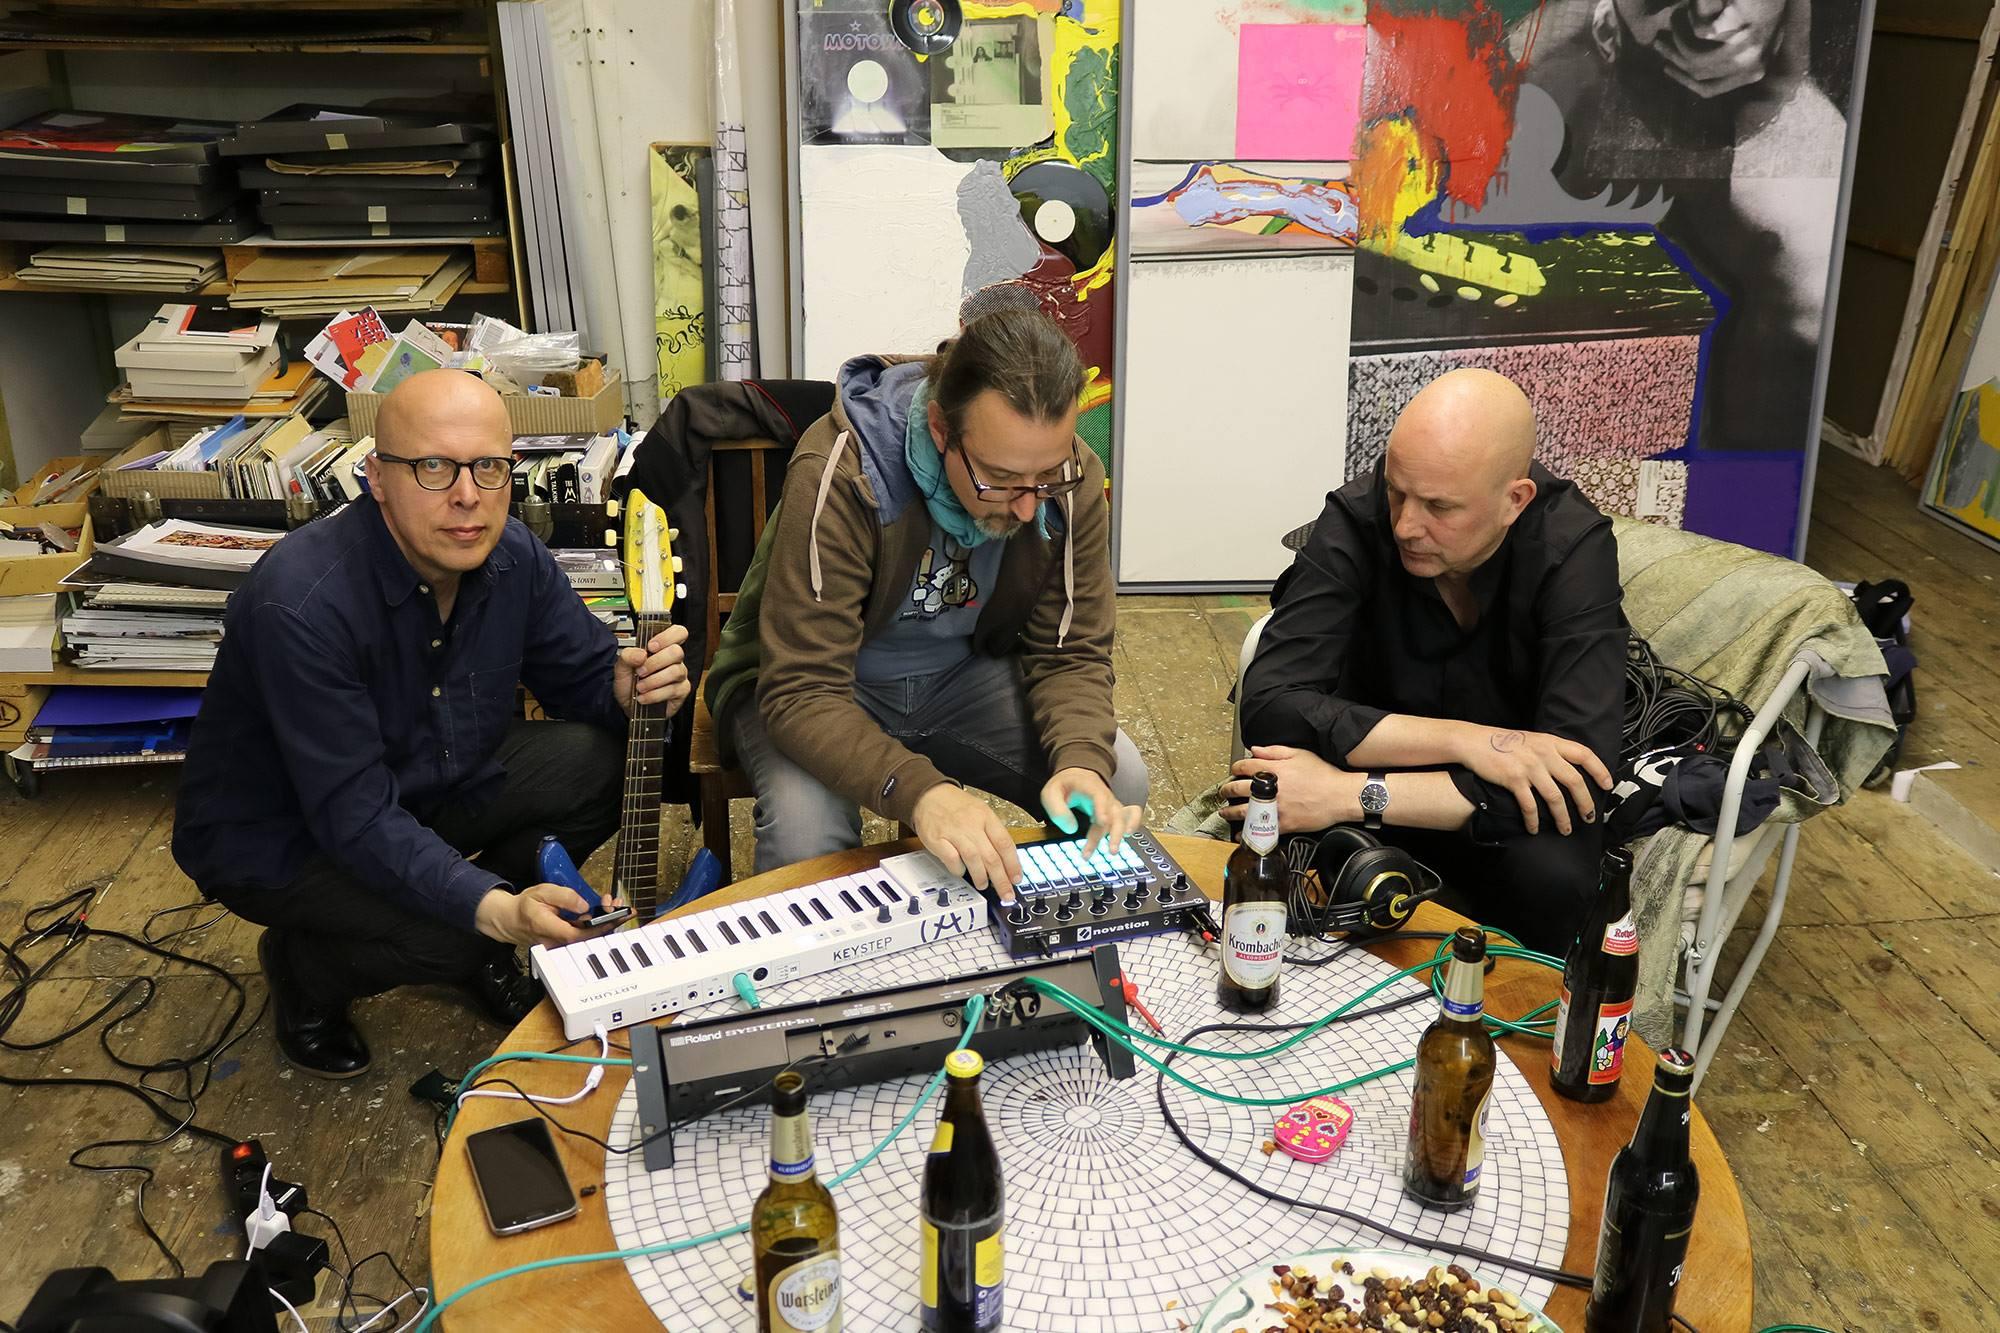 3 artists making music